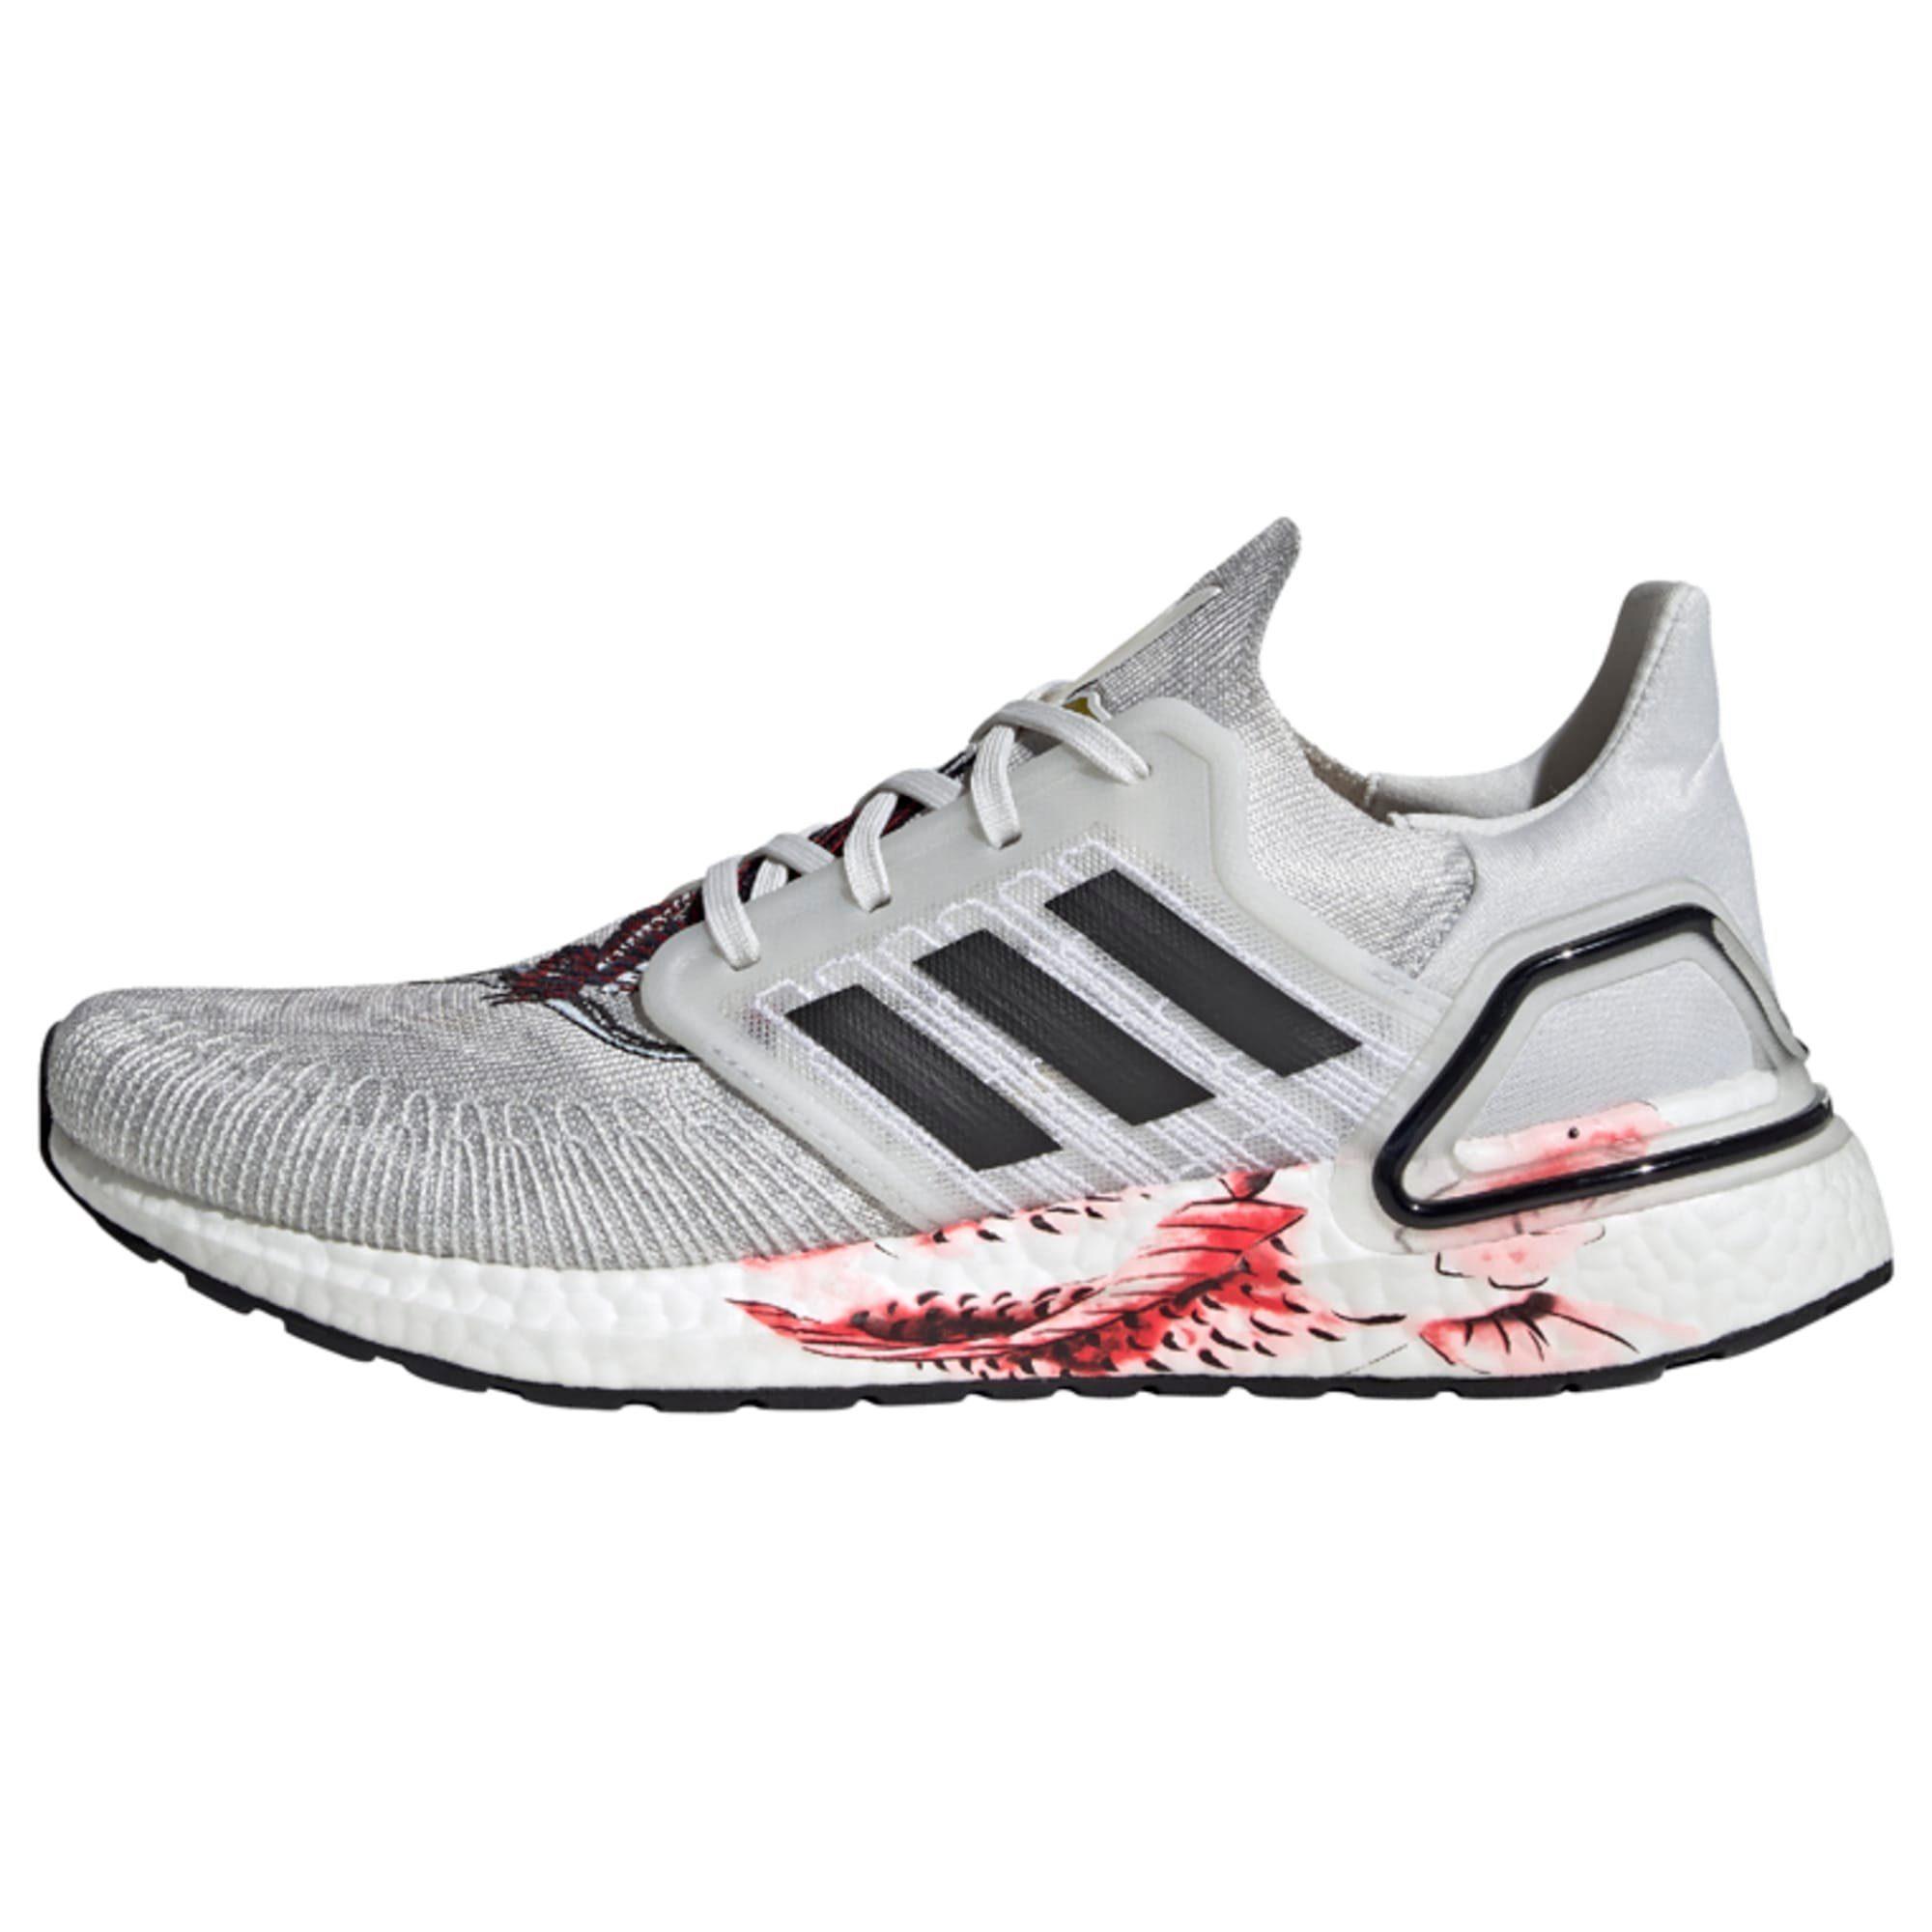 adidas Performance »Ultraboost 20 Schuh« Laufschuh UltraBoost;PrimeBlue;Parley online kaufen   OTTO